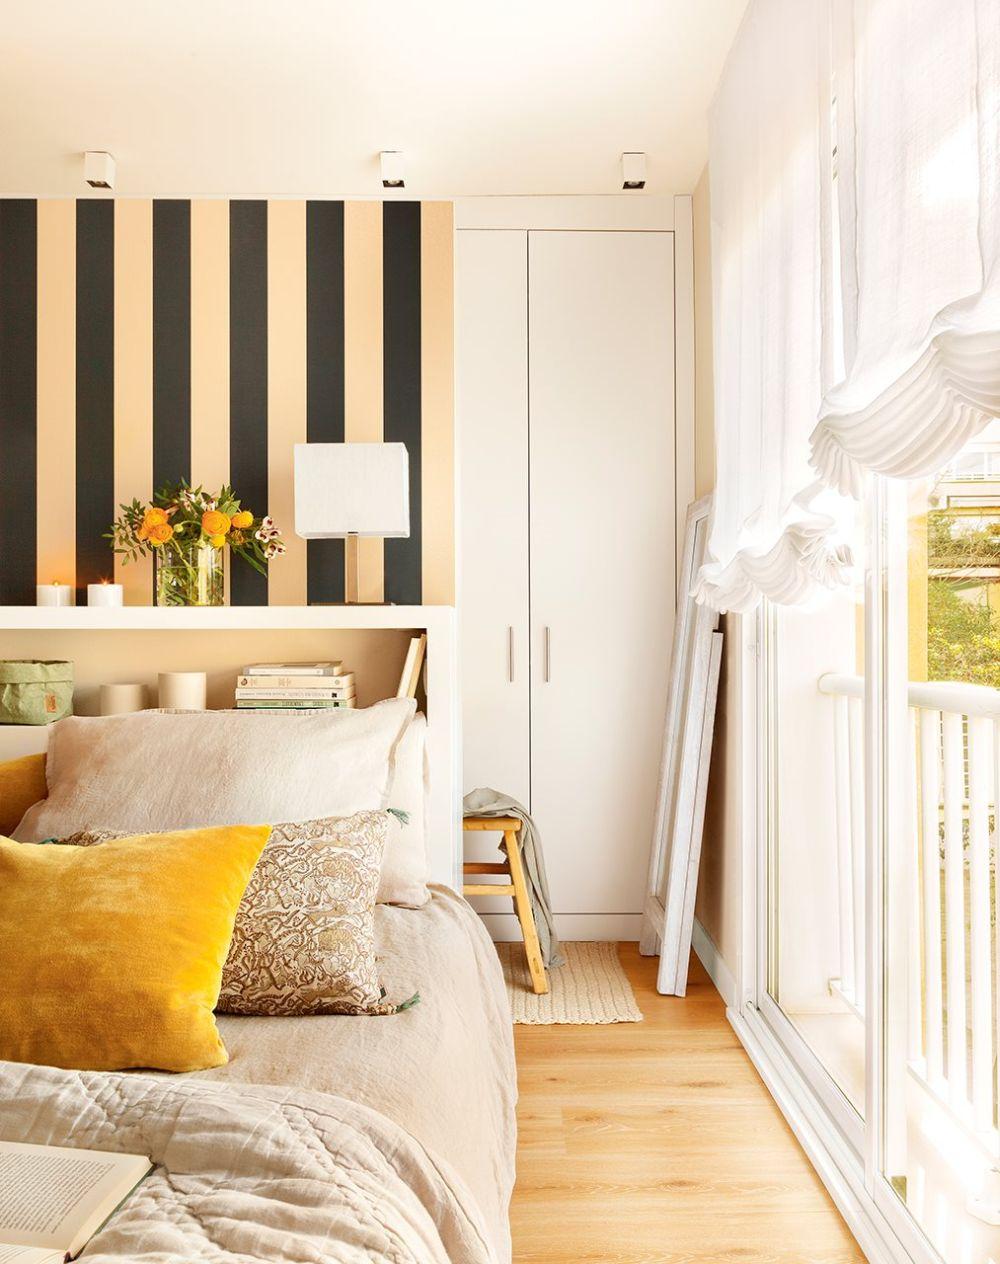 adelaparvu.com despre apartament 75 mp in tonuri deschise, designer Pia Capdevila, Foto Fernando Bedon, ElMueble (5)